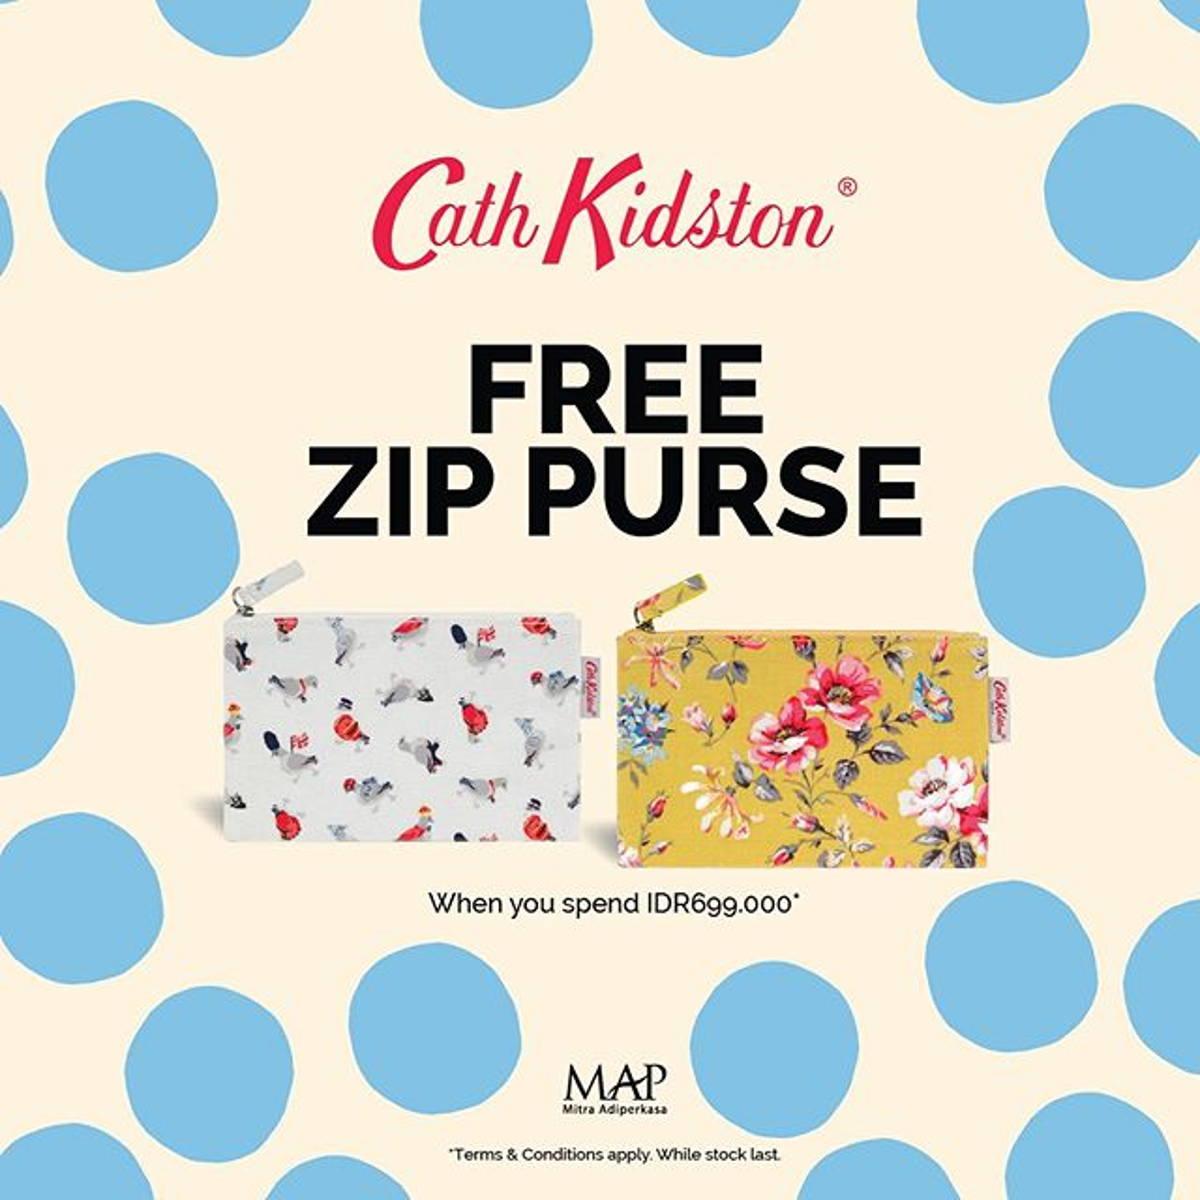 Katalog Promo: Cath Kidston: Promo FREE Zip Purse dengan pembelian min. Rp 699K - 1